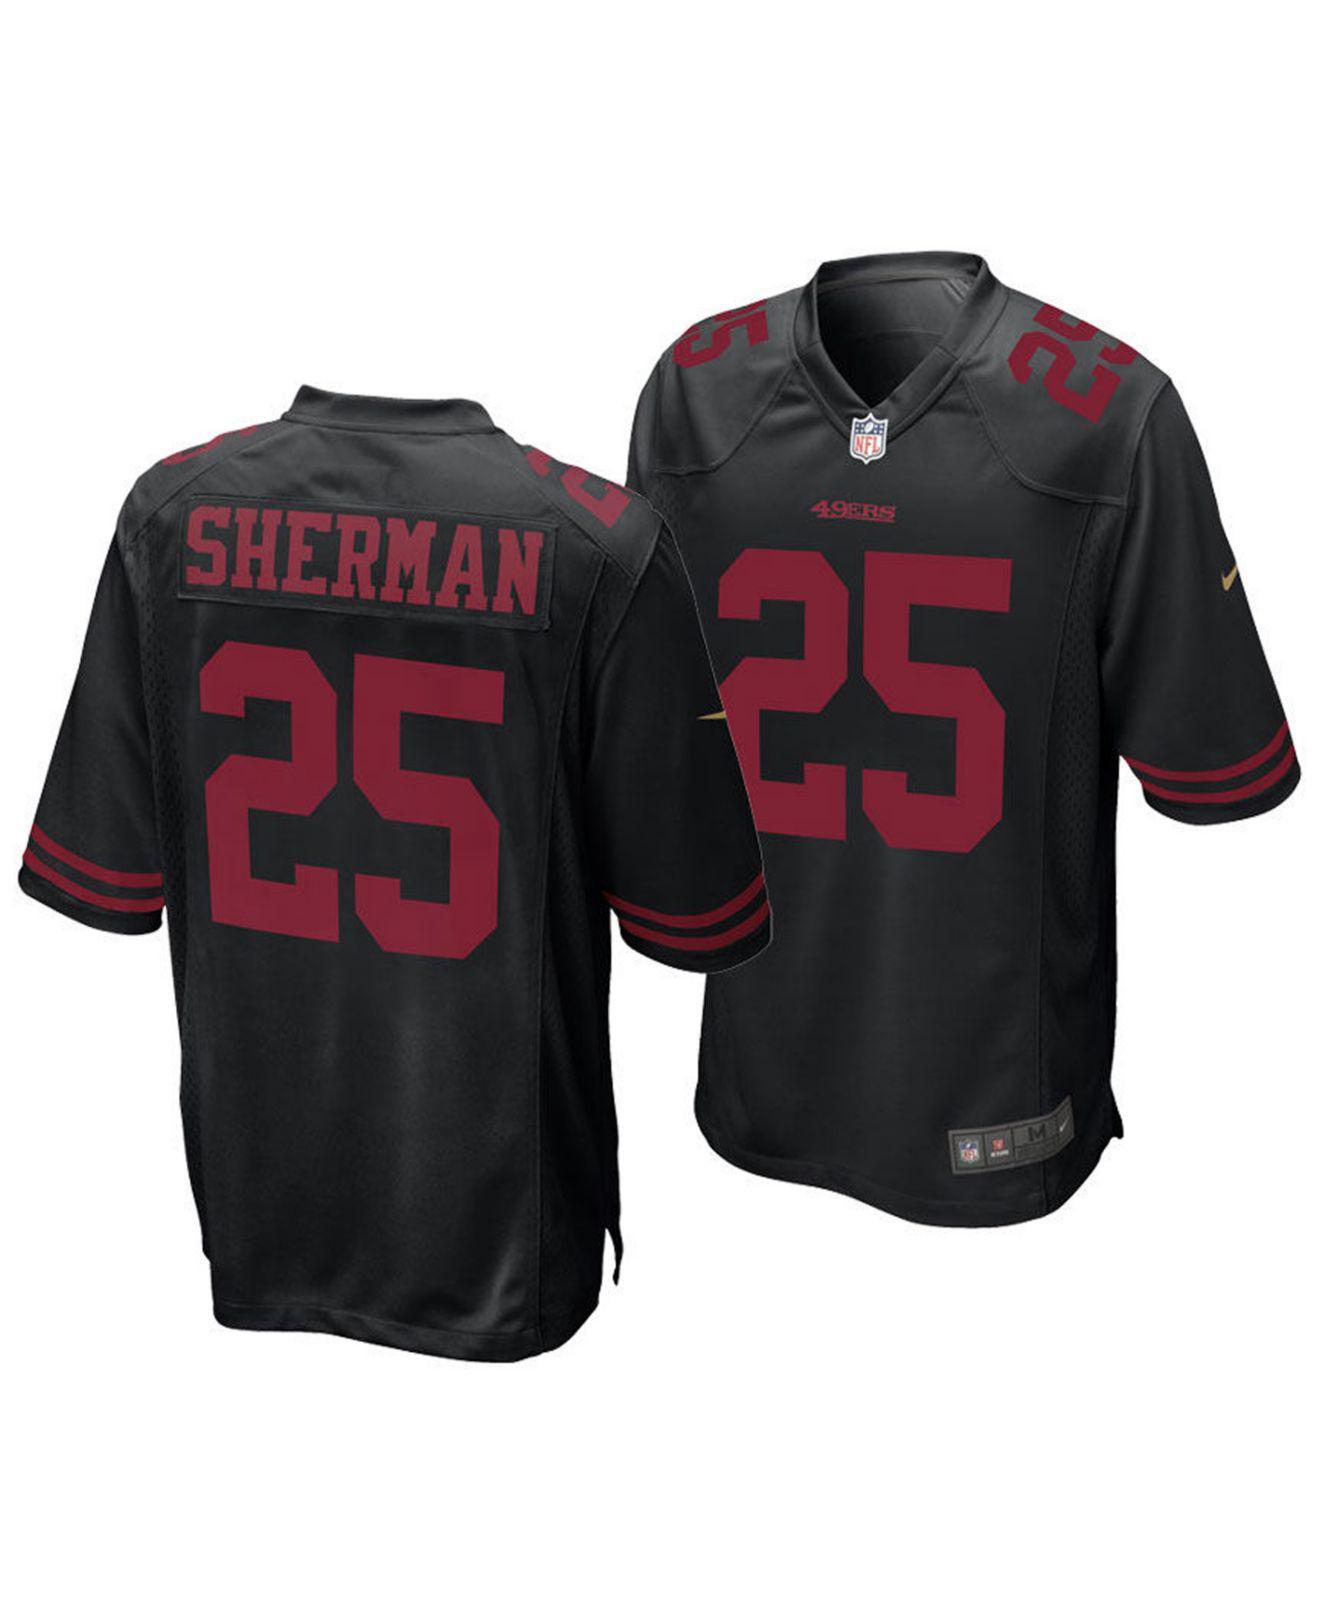 a528123d191 ... ireland nike. mens black richard sherman san francisco 49ers game jersey  1fcd9 f549b